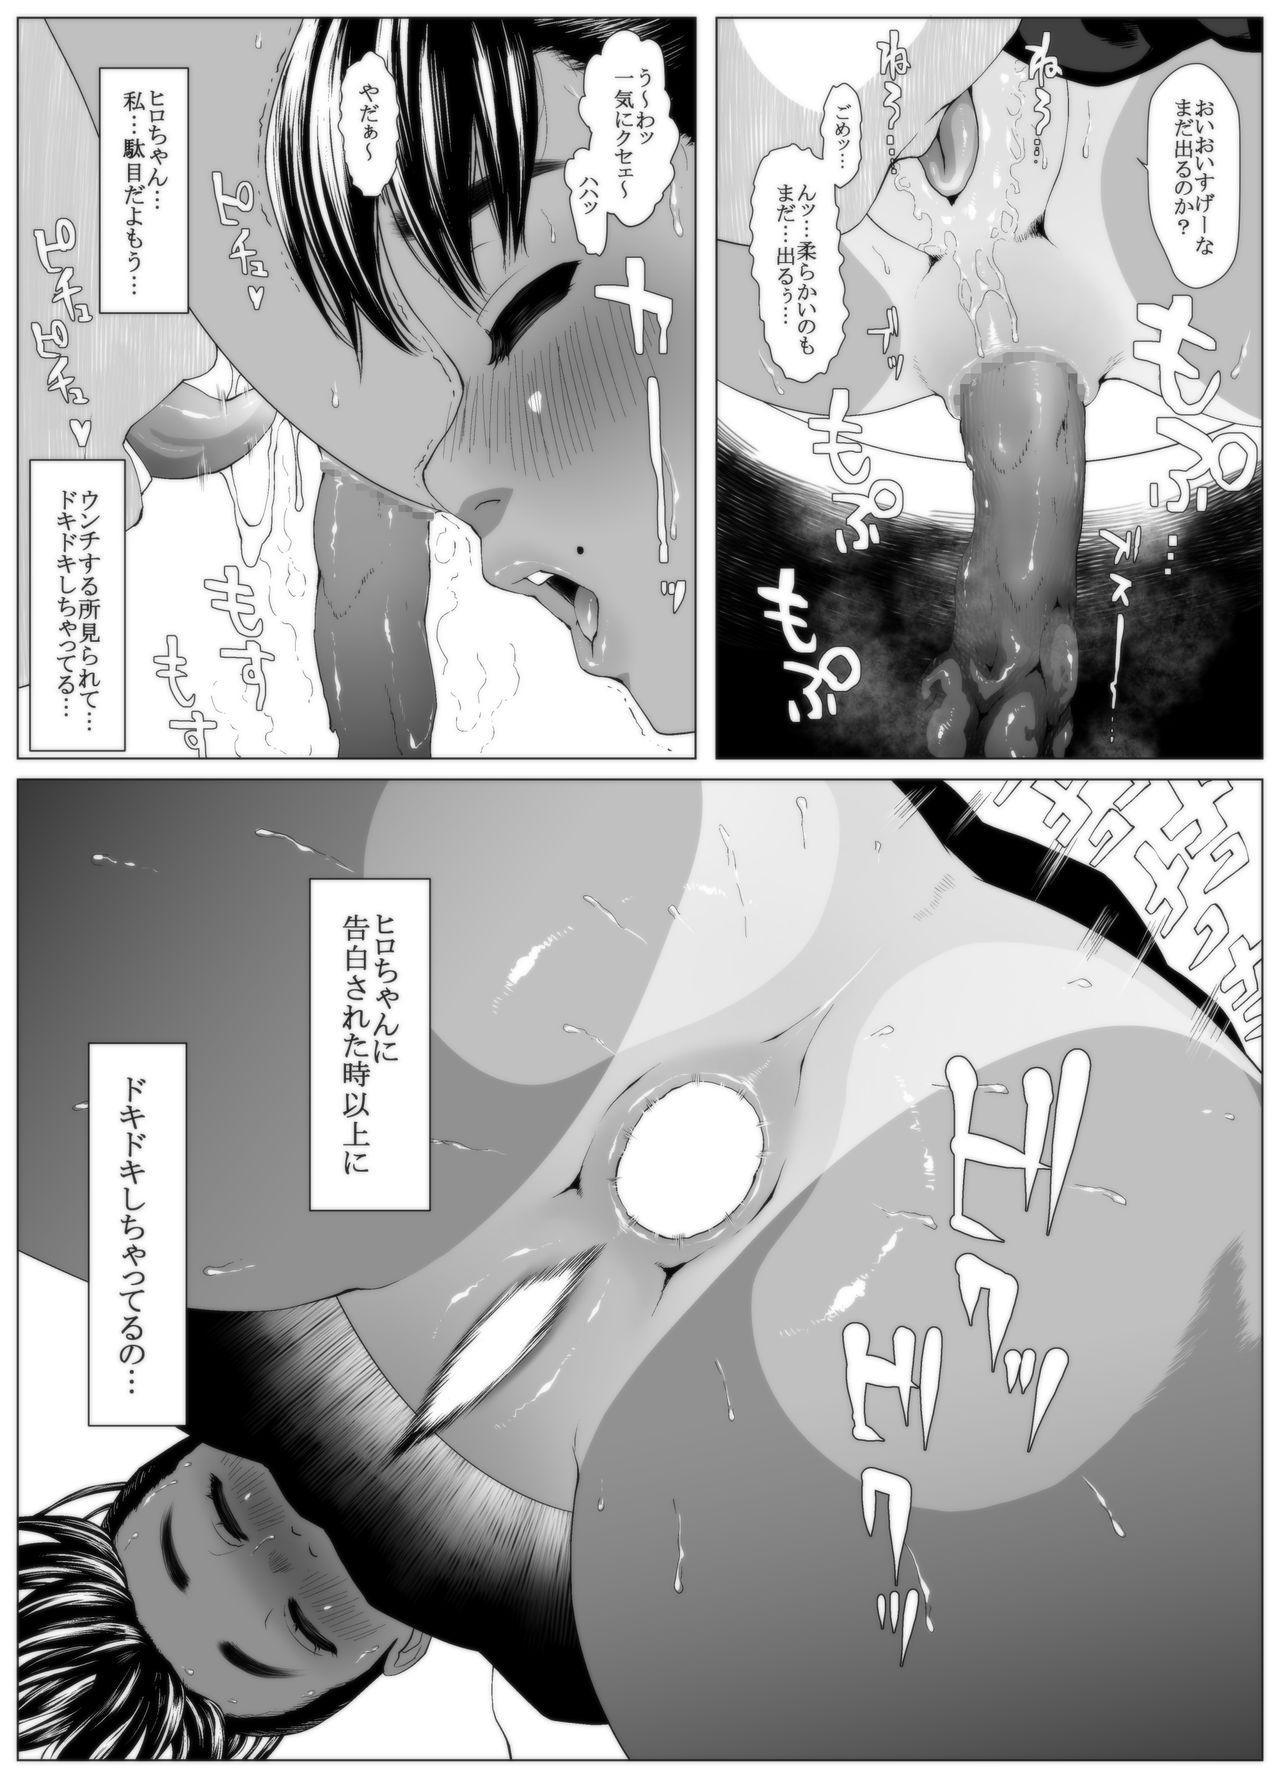 Koufukuron - Murase Ayumi Hen MANIAC: 1 20